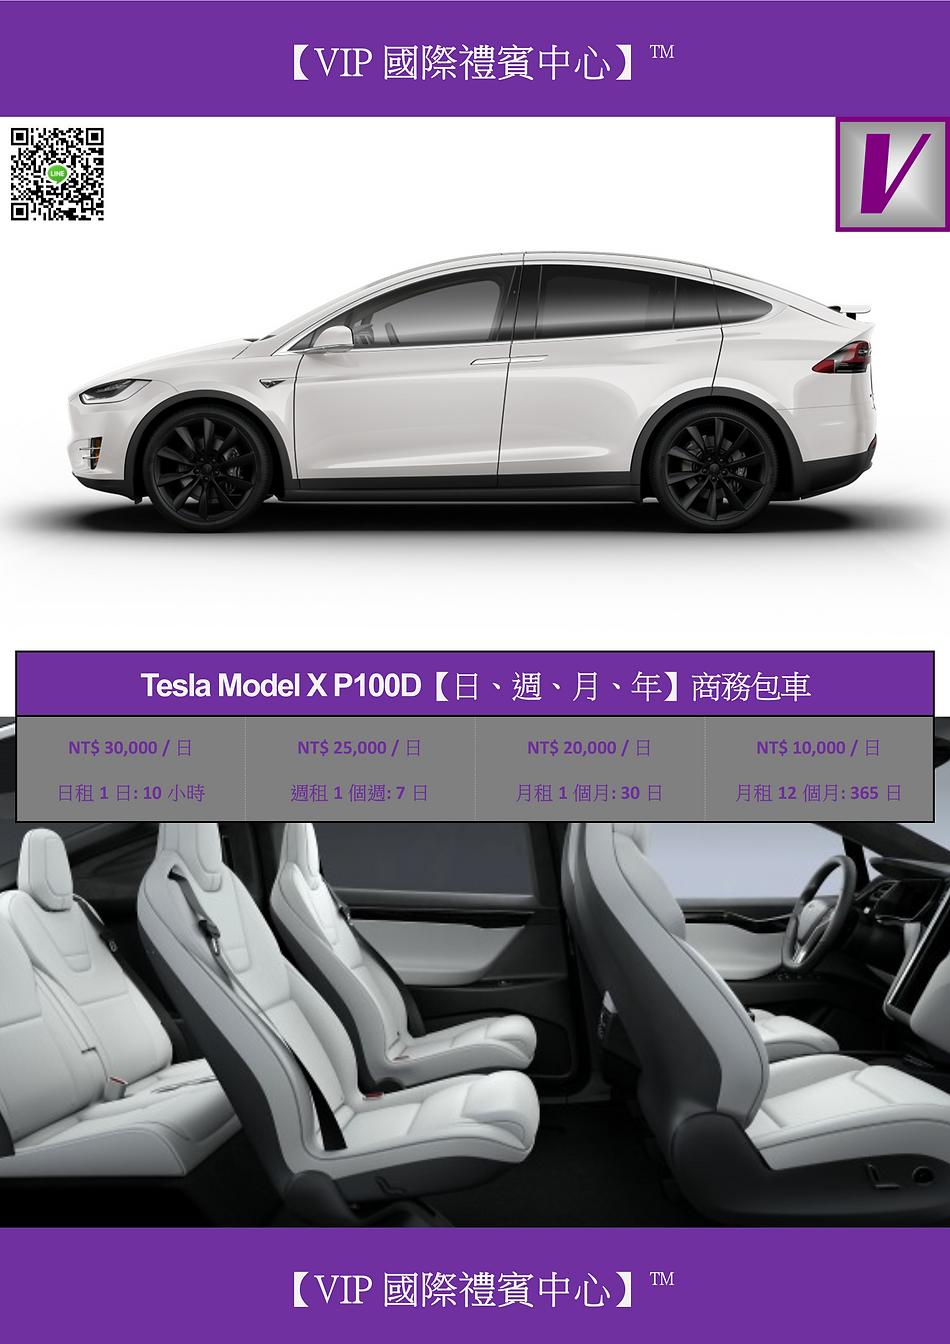 VIP國際禮賓中心 TESLA MODEL X P100D 臺中市區接送包車